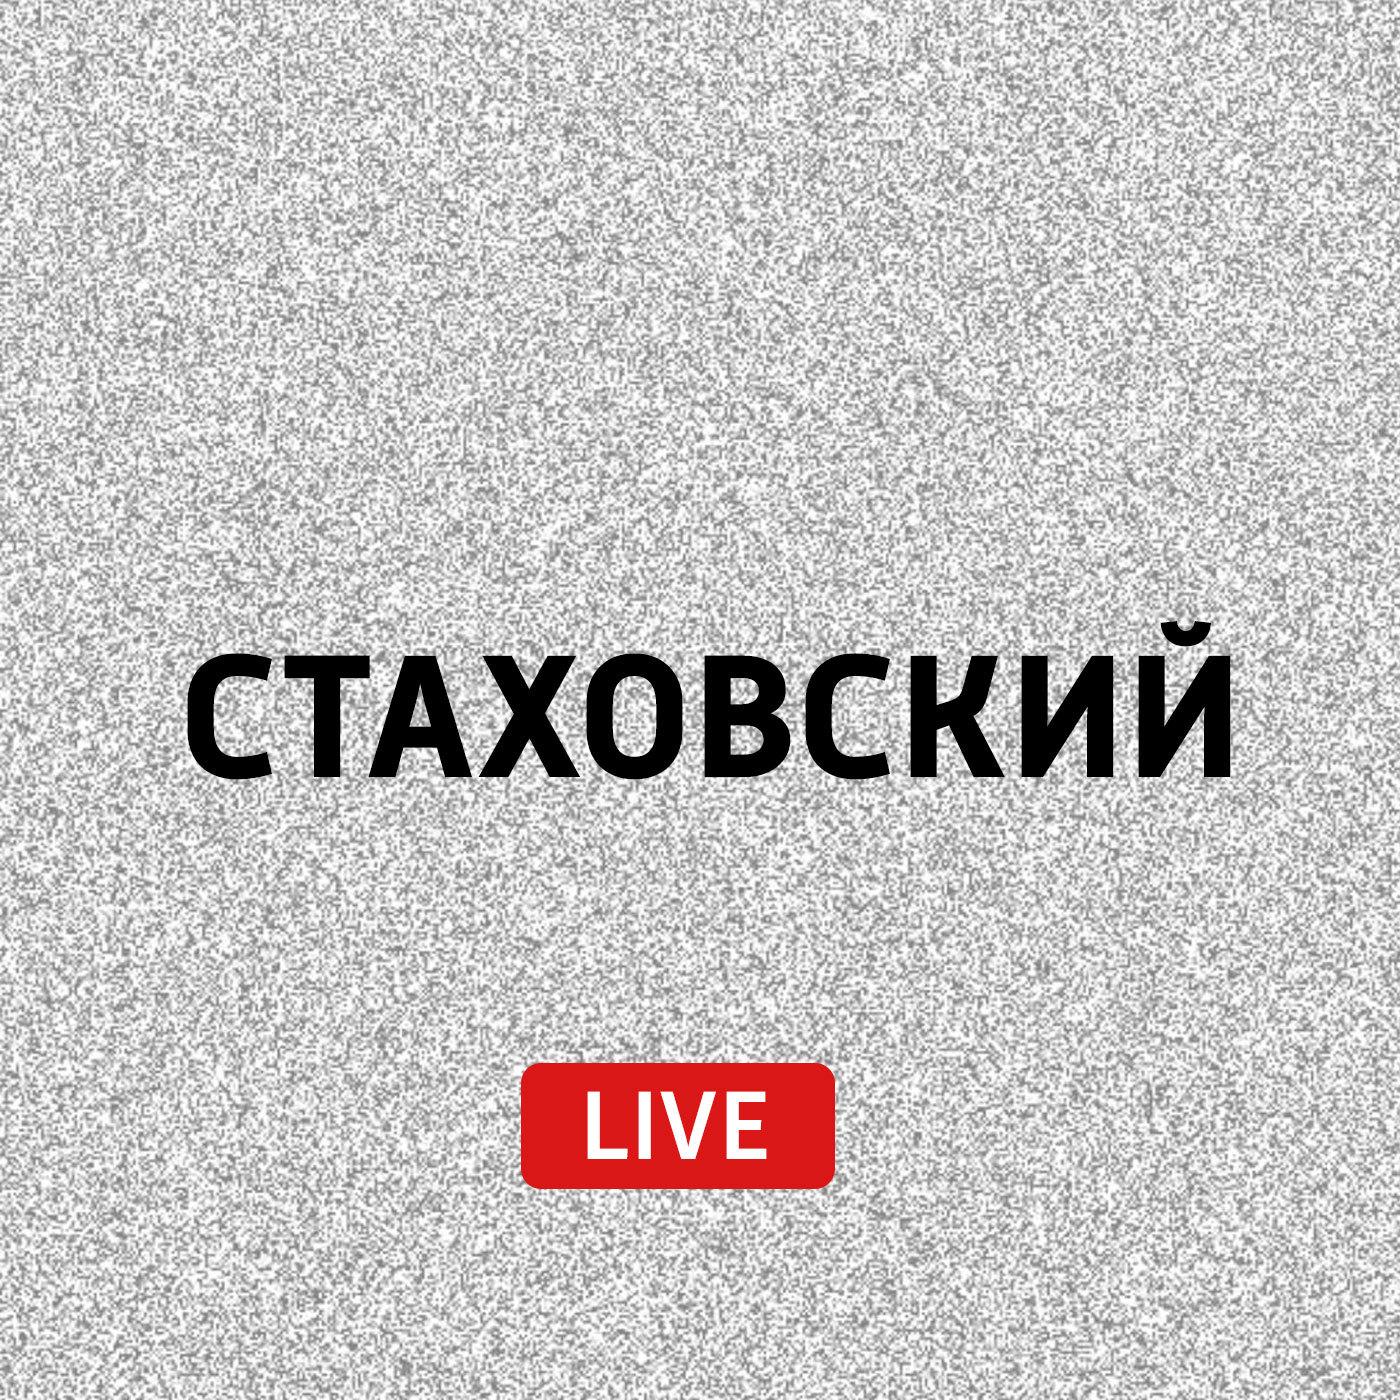 Евгений Стаховский Стаховский LIVE. Анонс евгений стаховский кнут гамсун